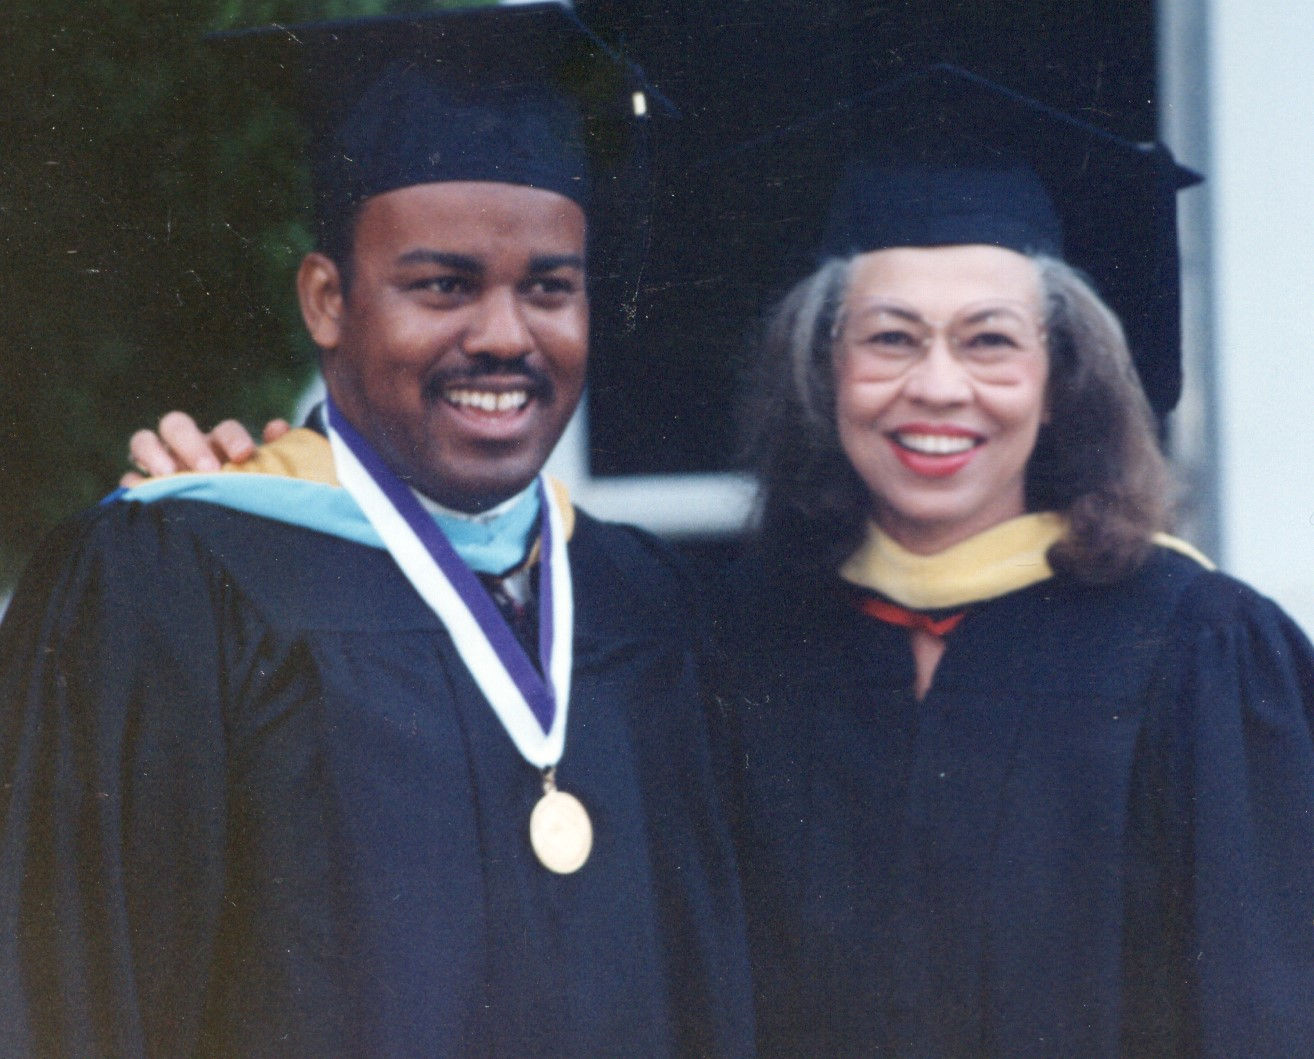 Hampton at graduation ceremony with former SJCC President Del Anderson